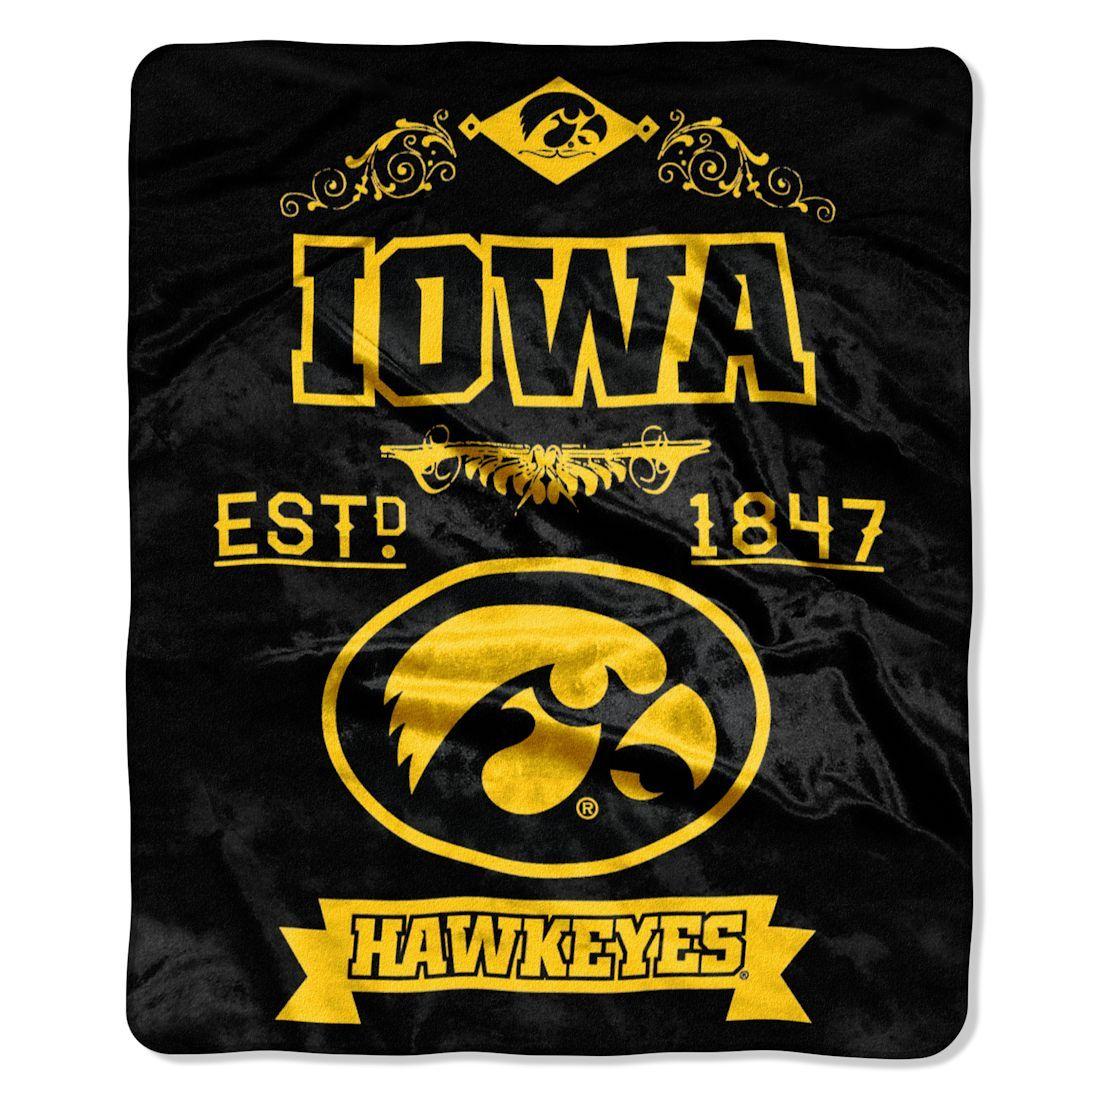 Iowa Hawkeyes Blanket 50x60 Raschel Label Design Iowa